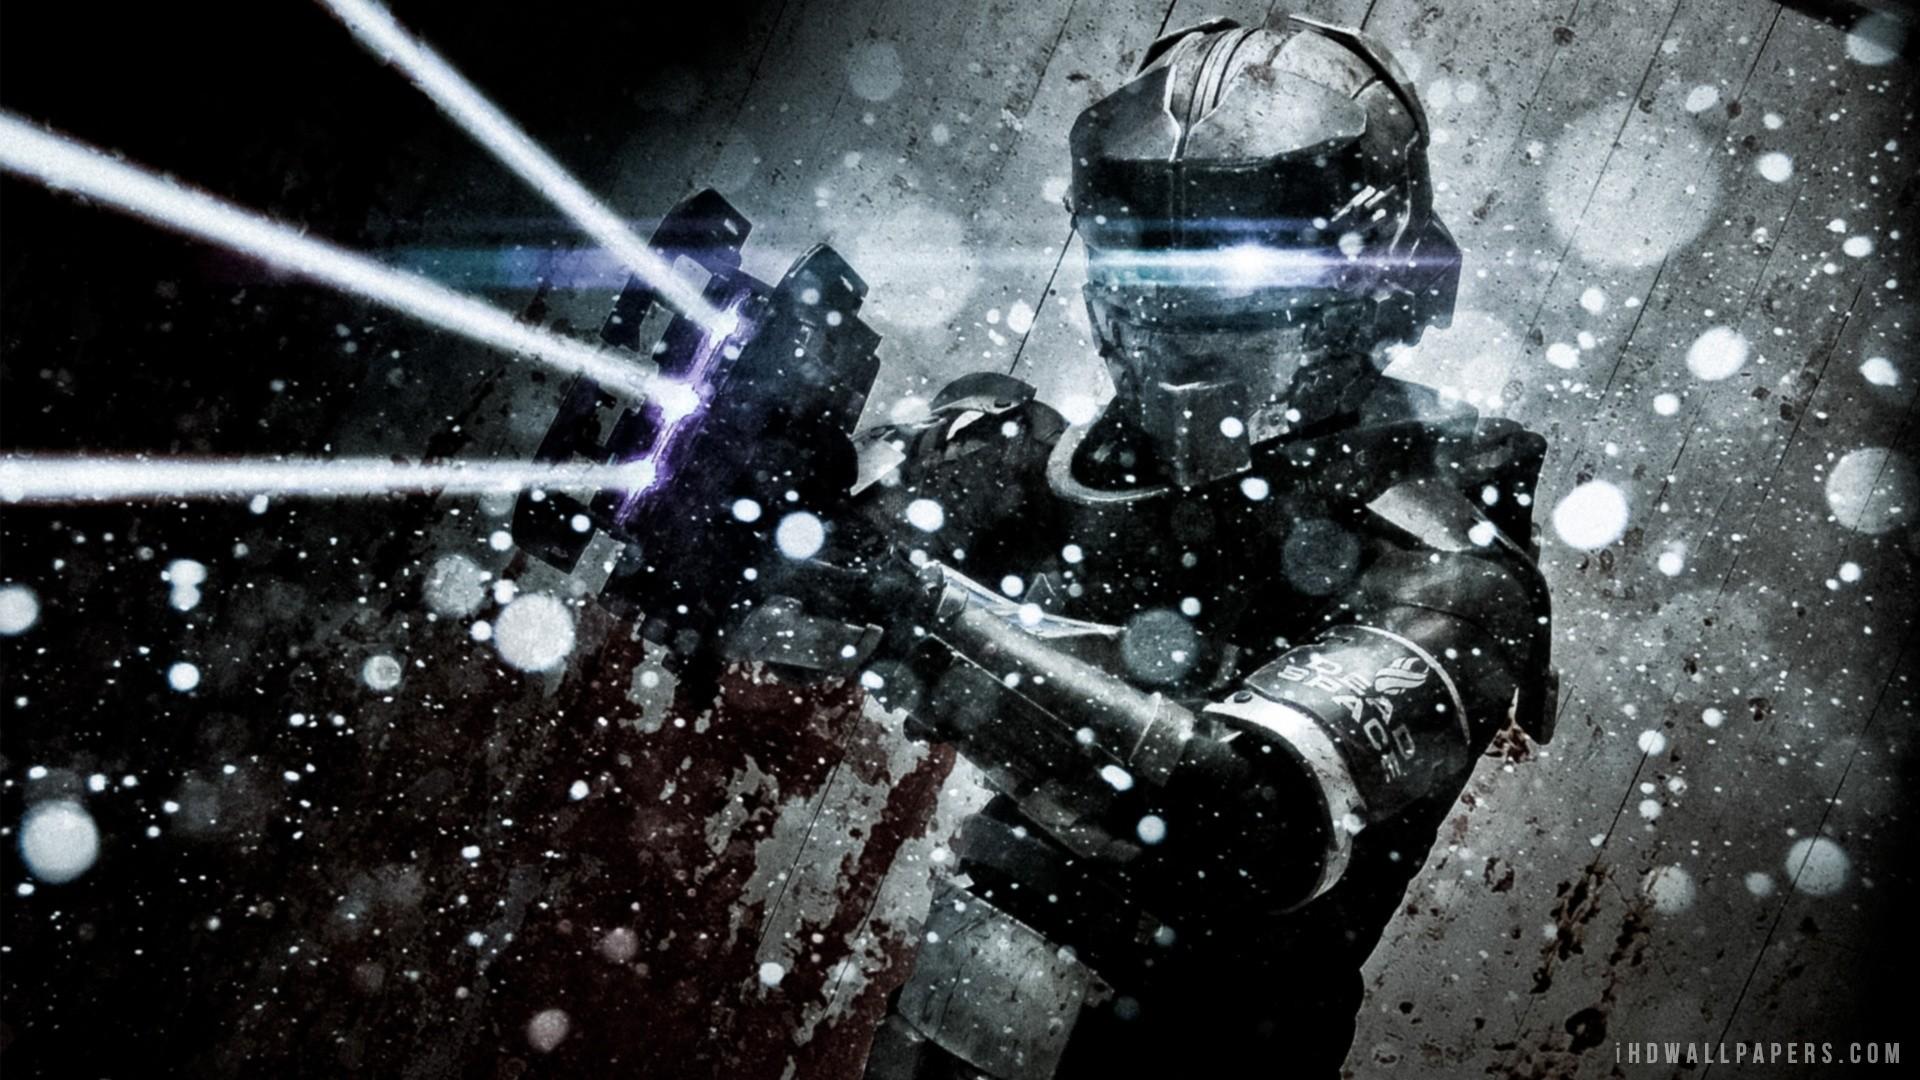 Description: Download Dead Space Wallpaper/Background in HD .